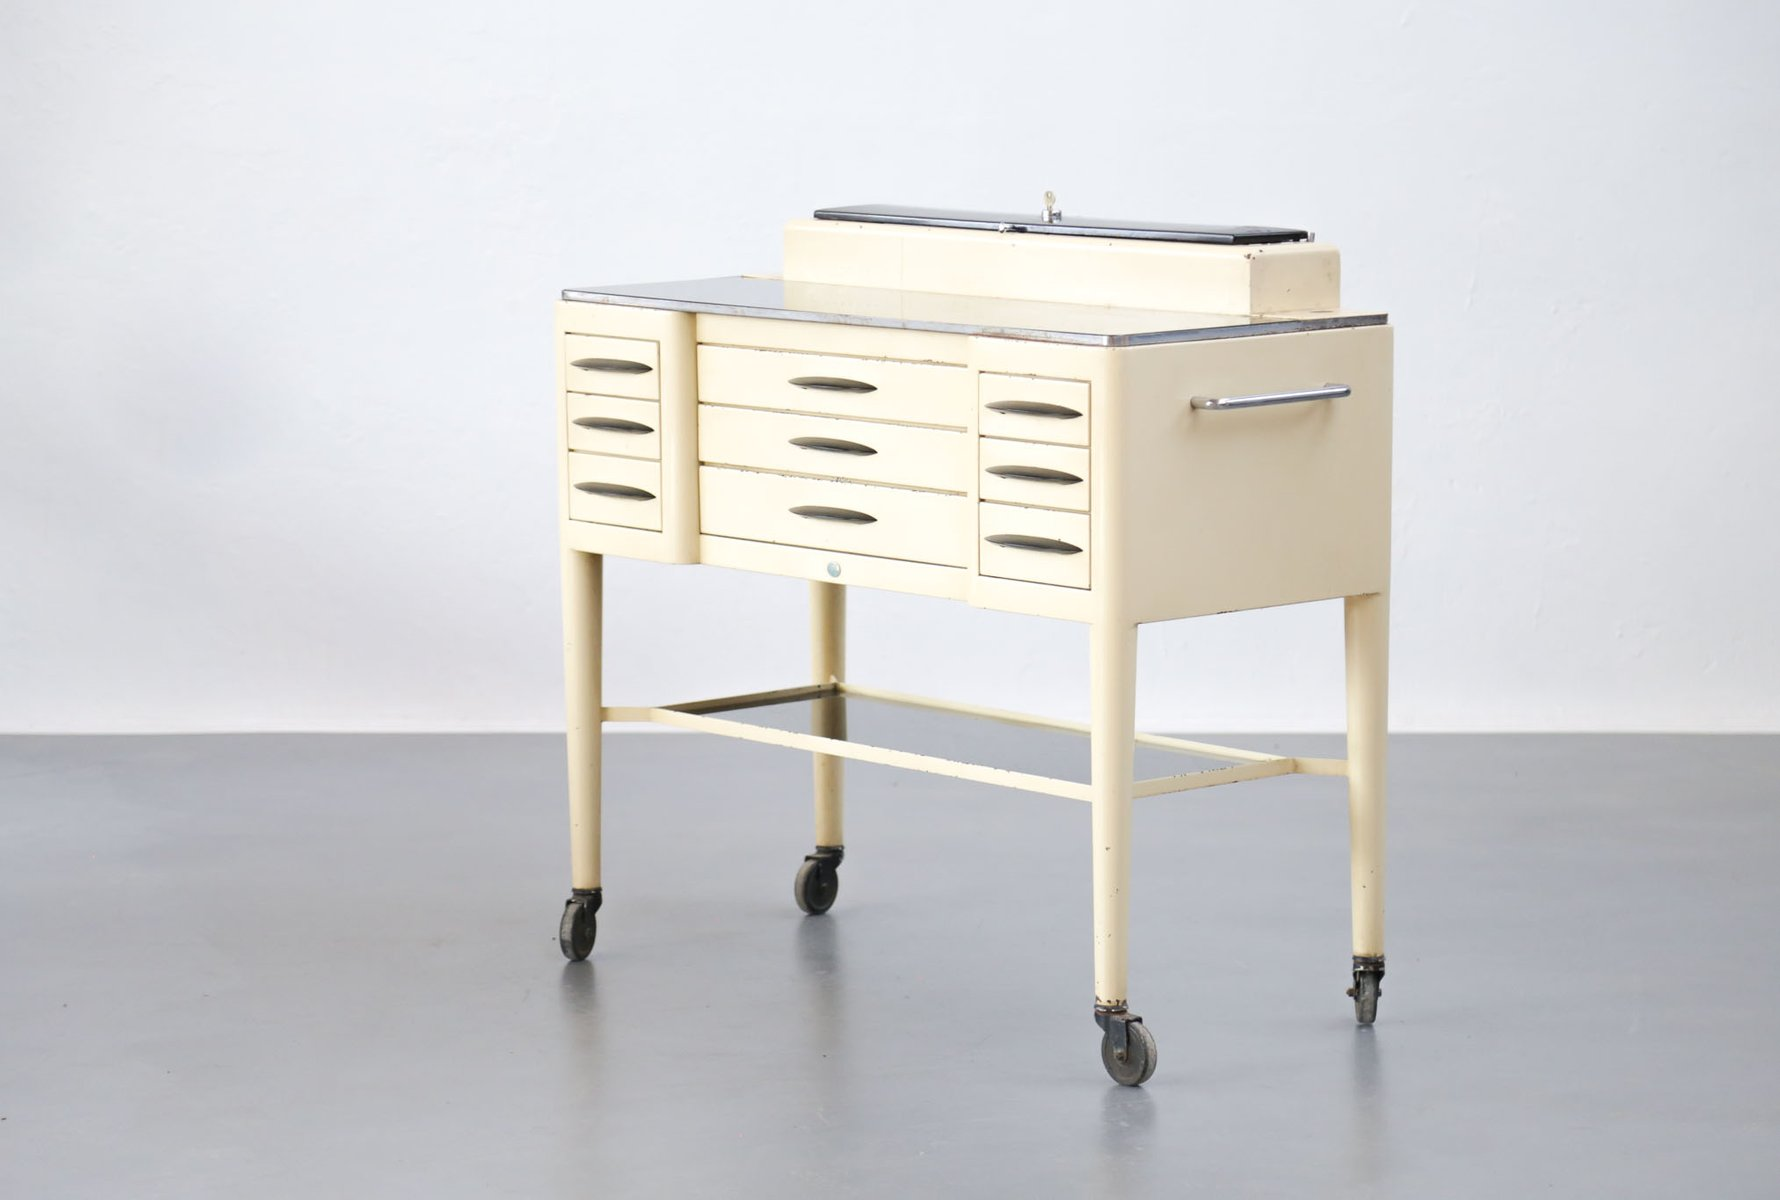 commode de dentiste en fer verre 1950s en vente sur pamono. Black Bedroom Furniture Sets. Home Design Ideas